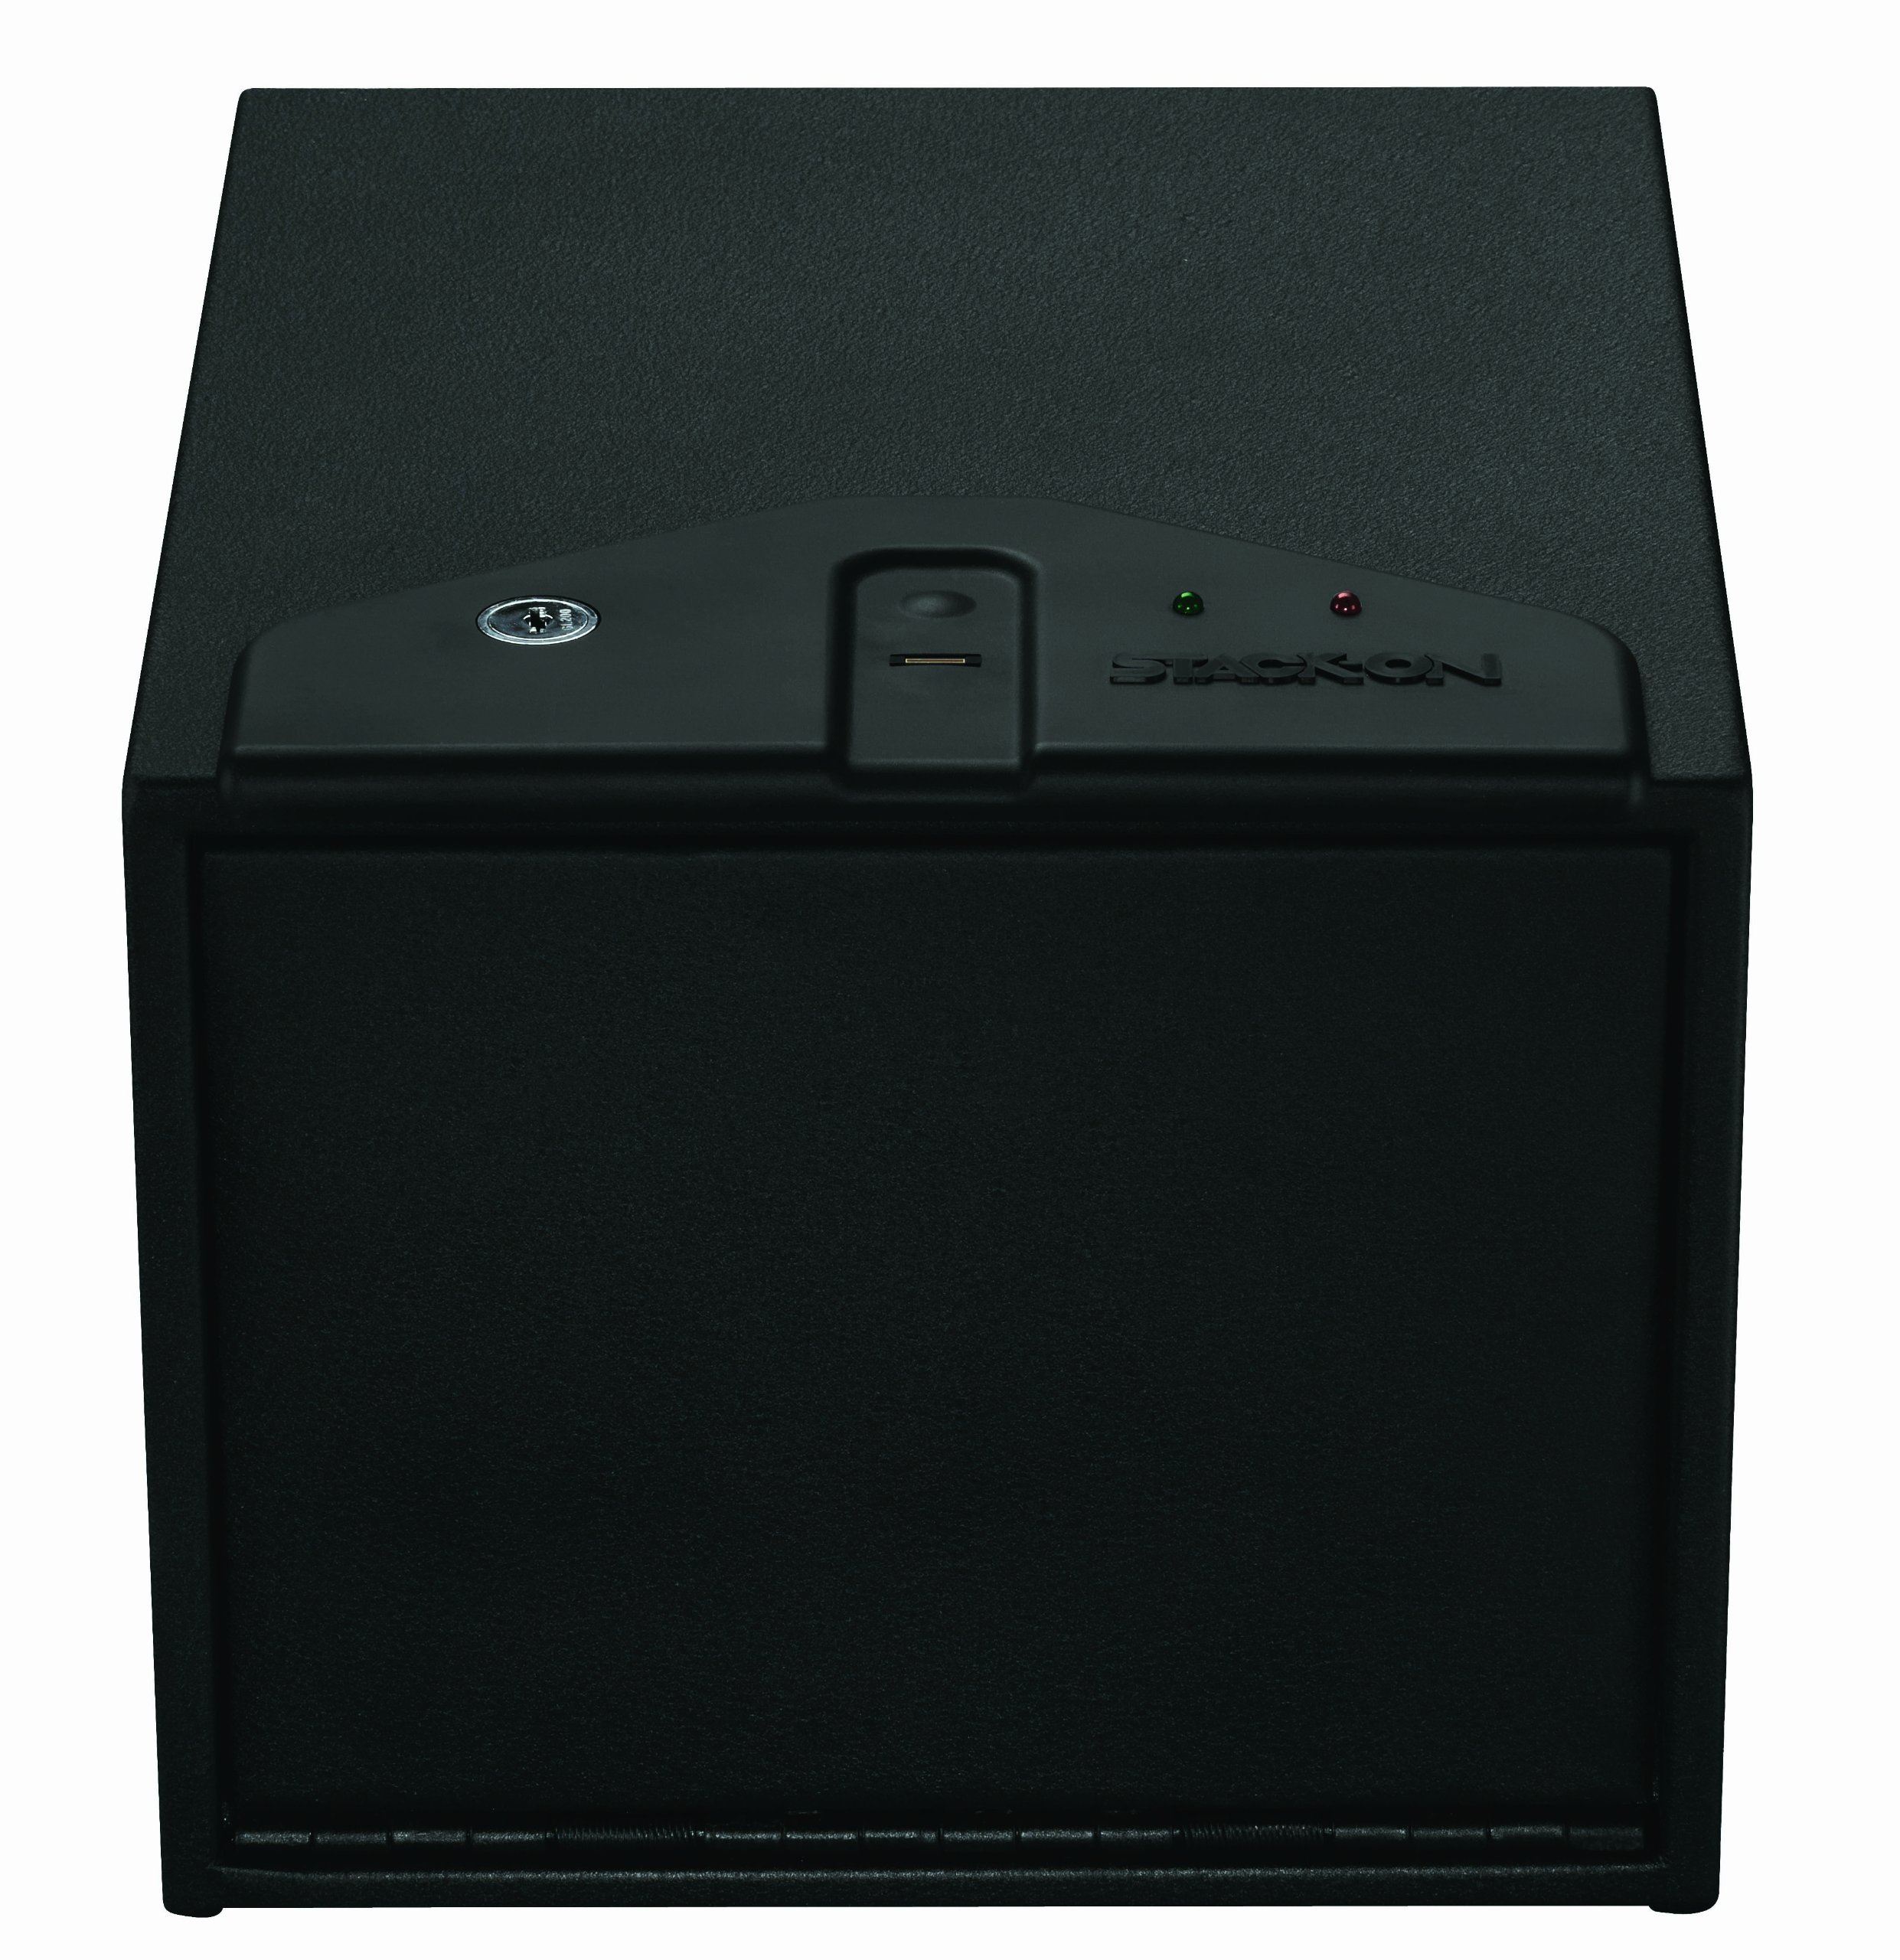 Stack-On QAS-1200-B Quick Access Safe Biometric Lock, Black